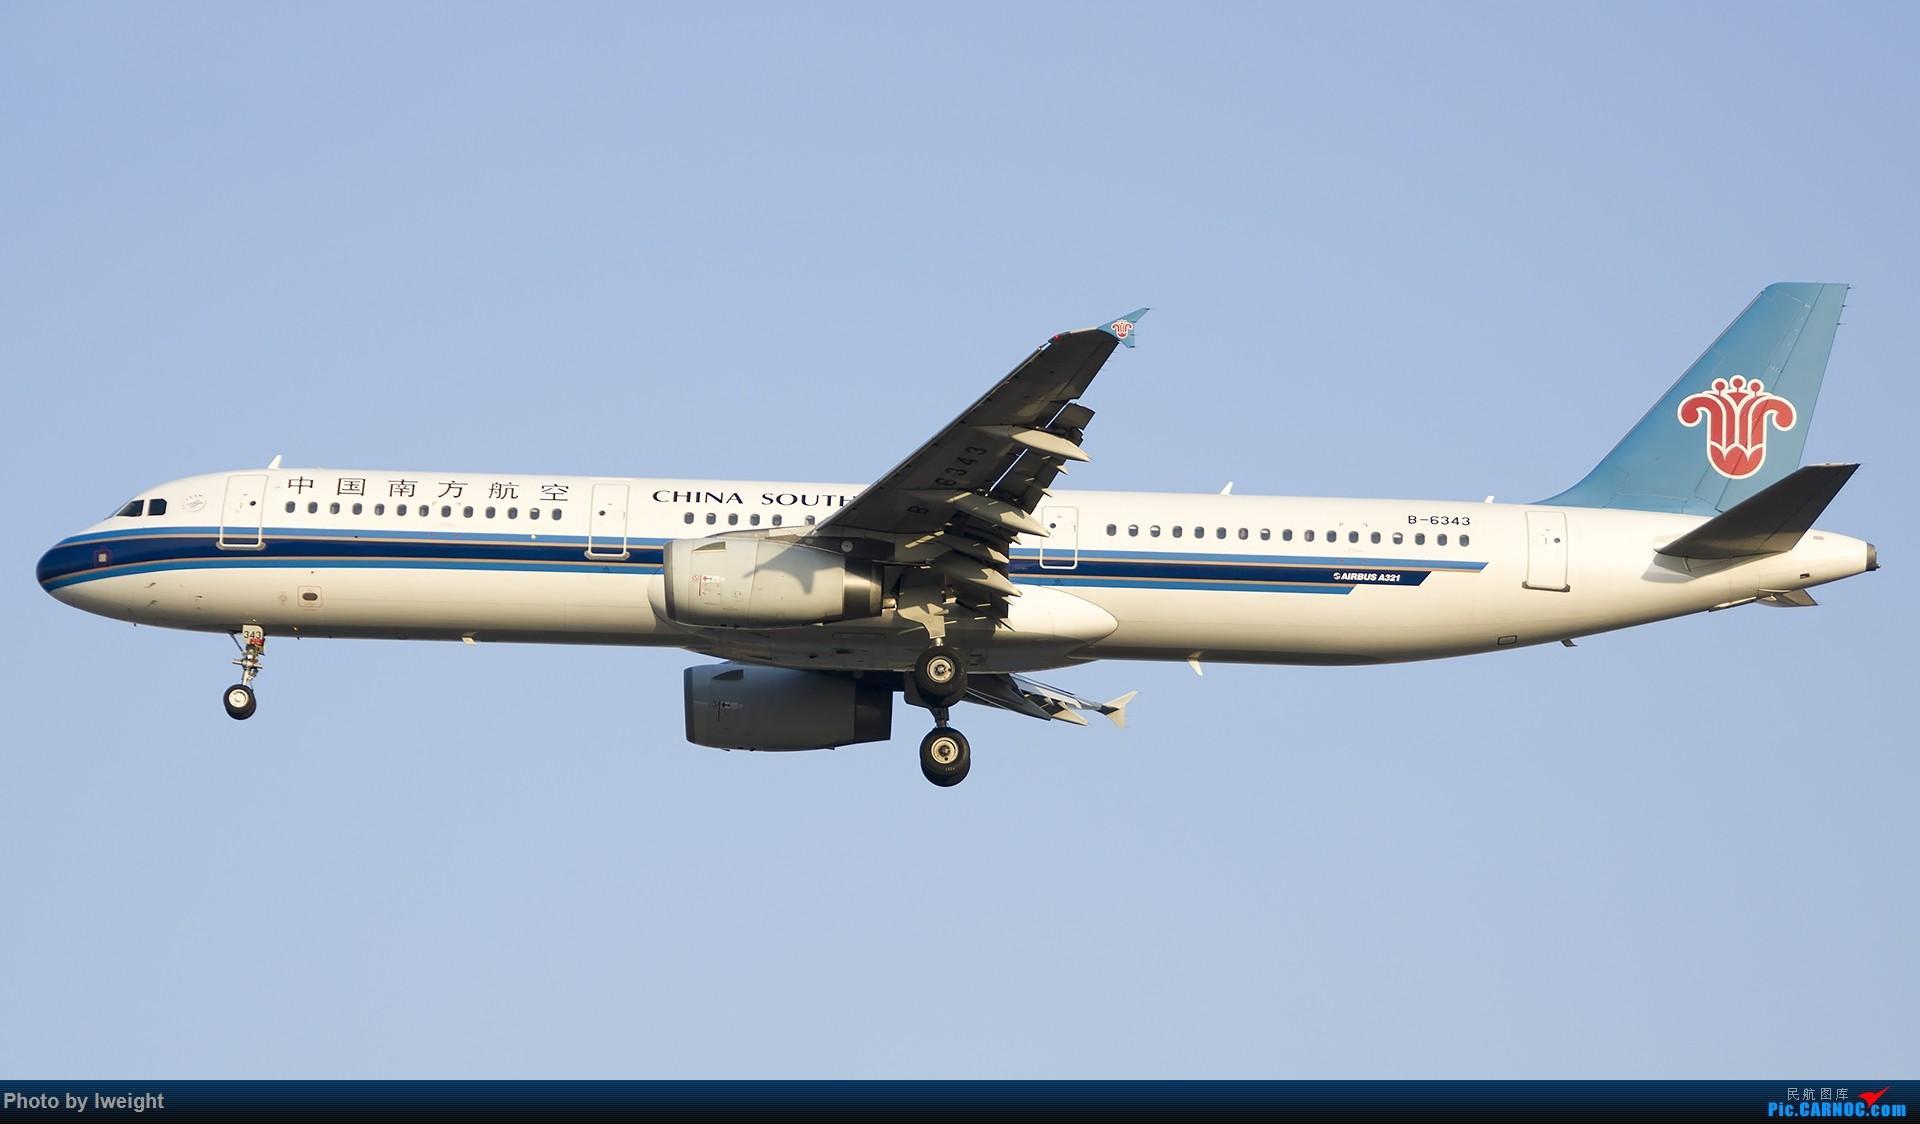 Re:[原创]庆祝升级777,发上今天在首都机场拍的所有飞机【2014-12-14】 AIRBUS A321-200 B-6343 中国北京首都国际机场